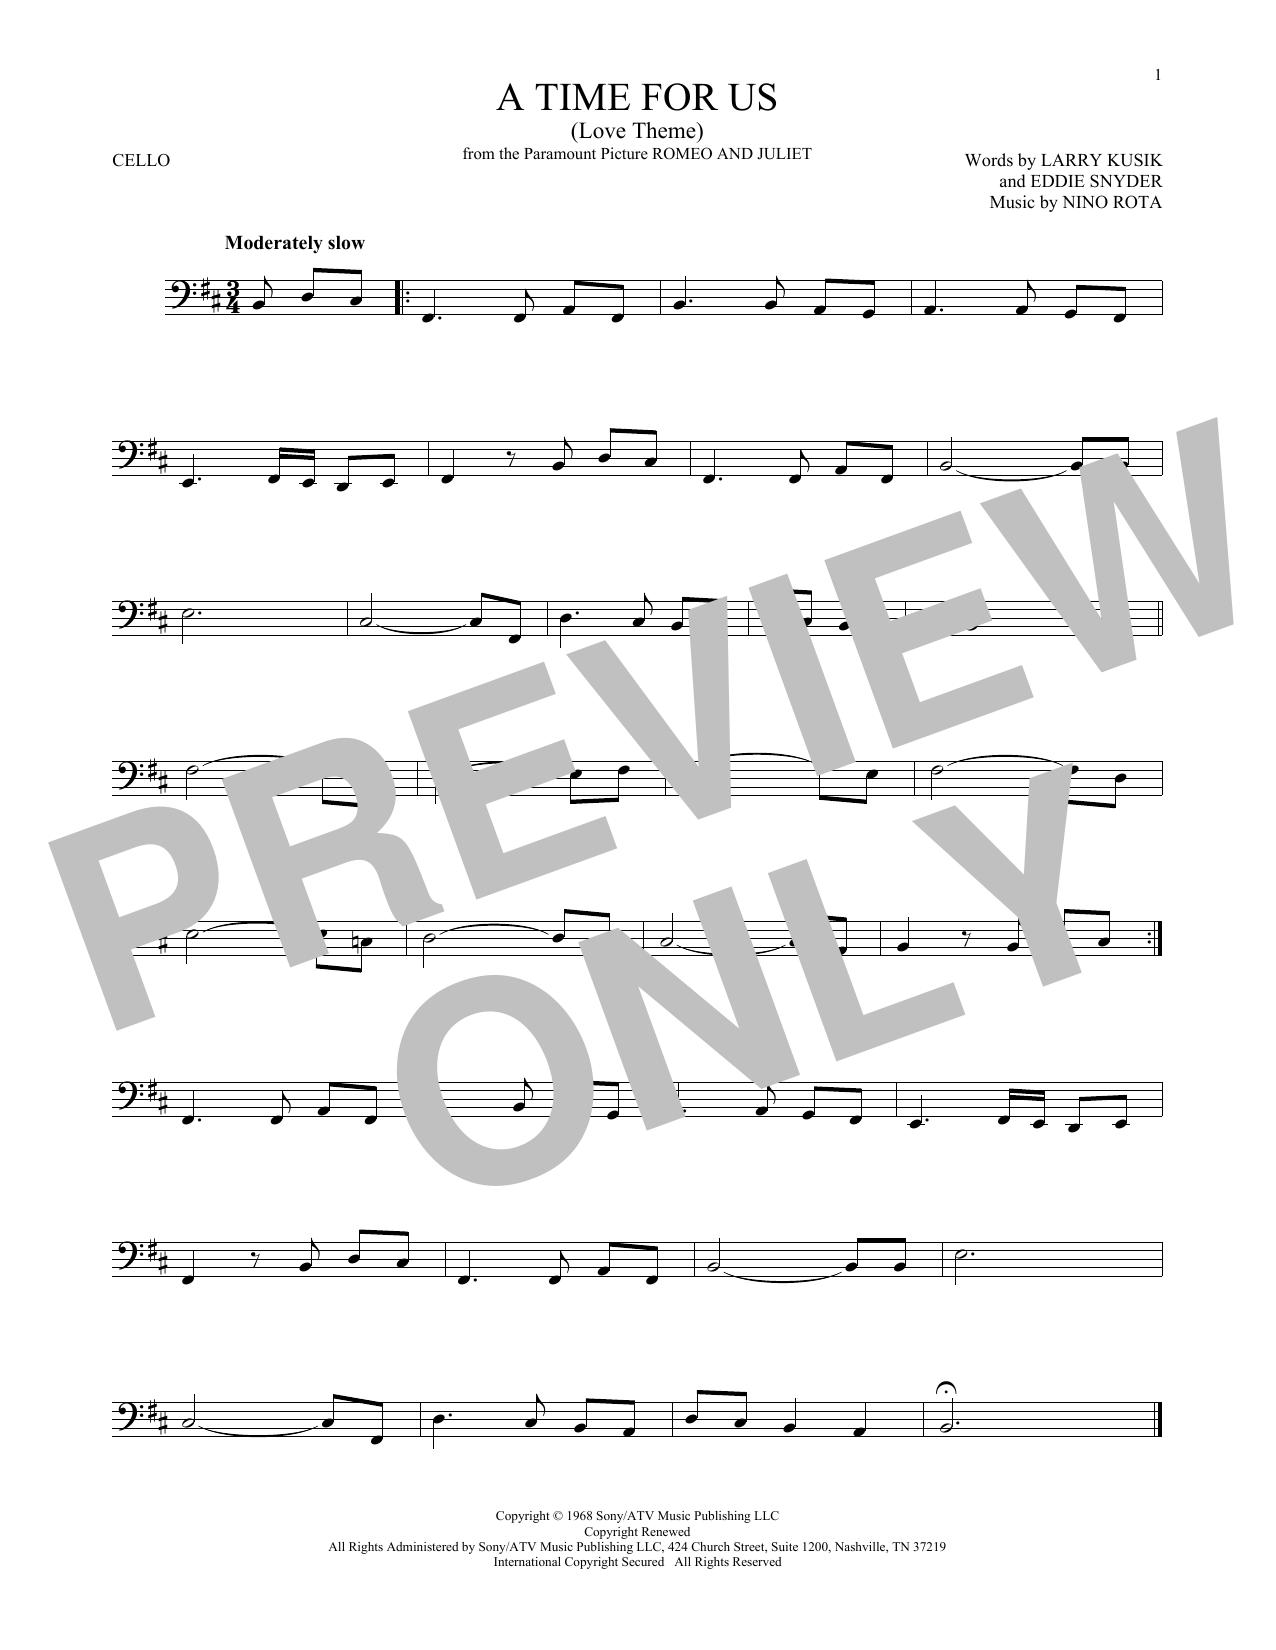 A Time For Us (Love Theme) (Cello Solo)